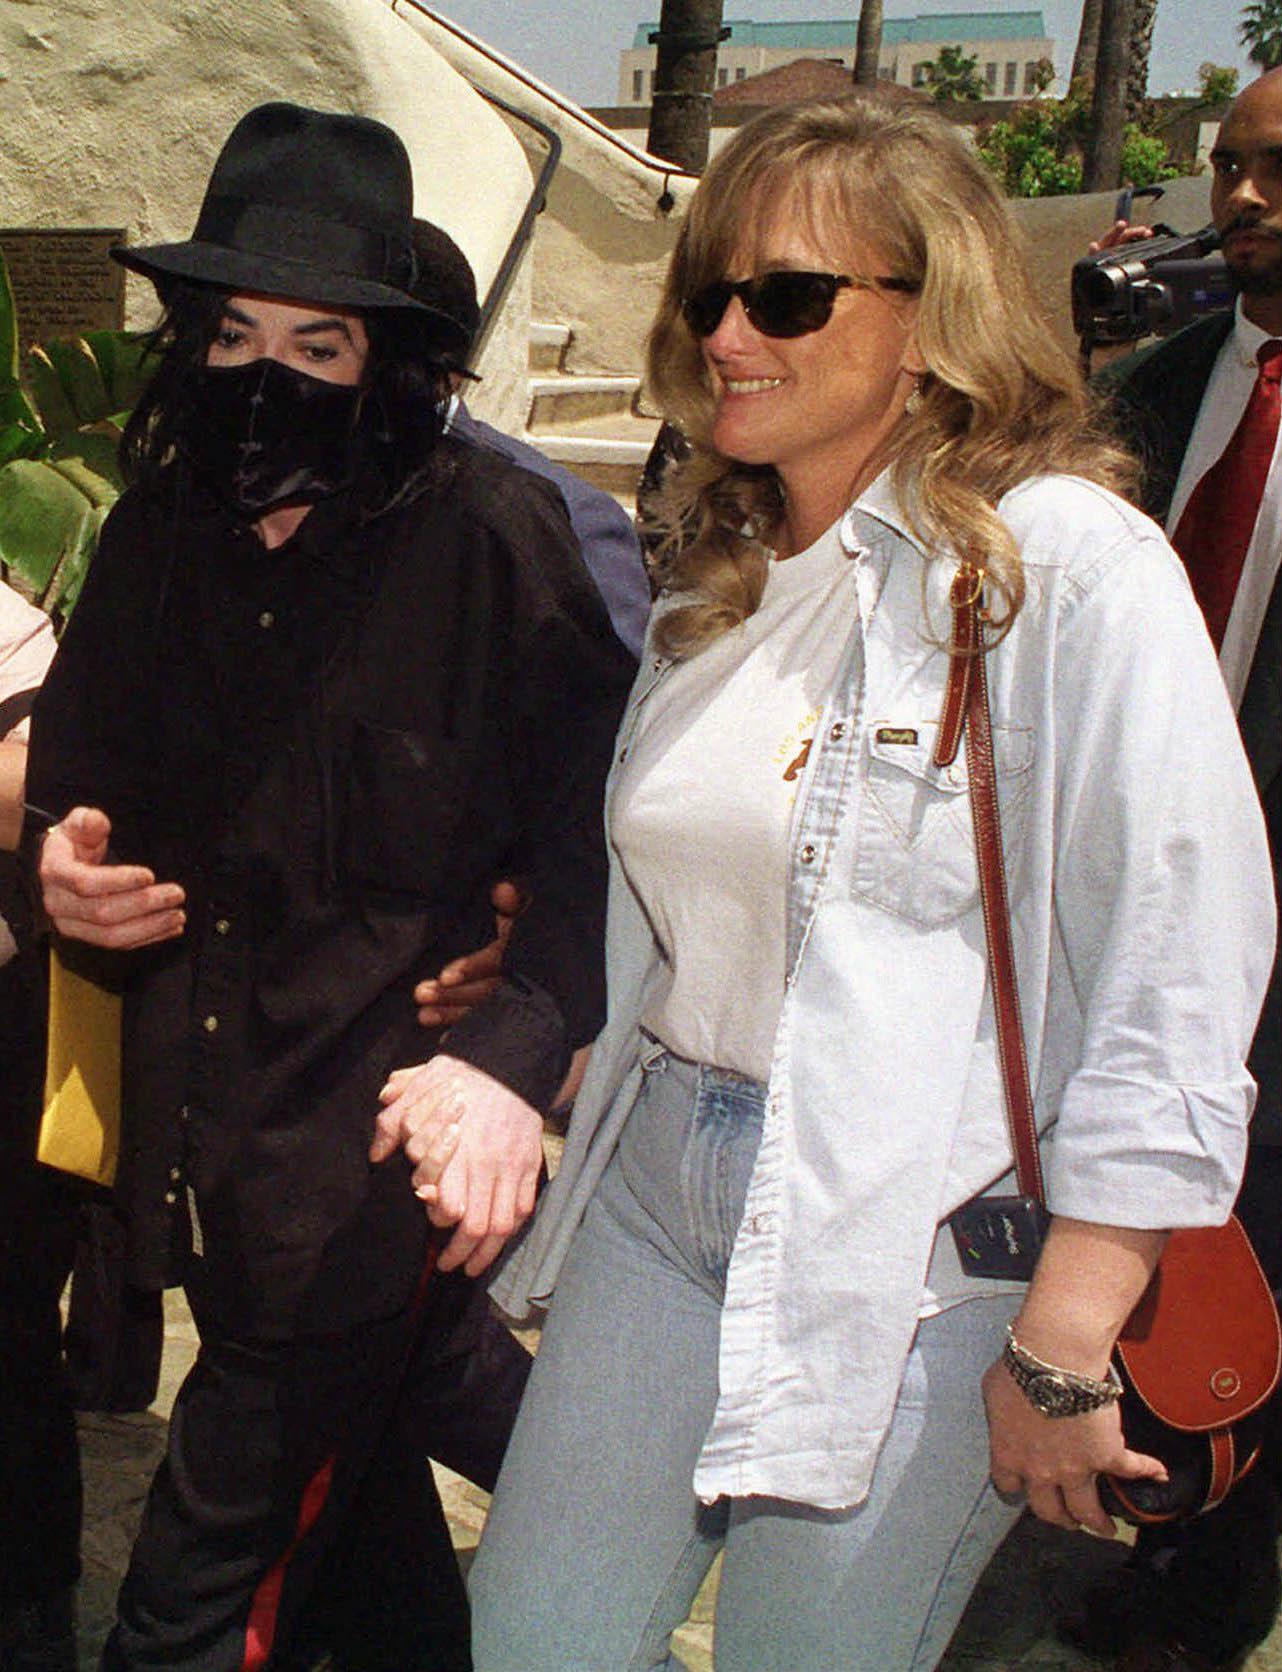 Michael Jackson, trayectoria musical, imágenes, vida